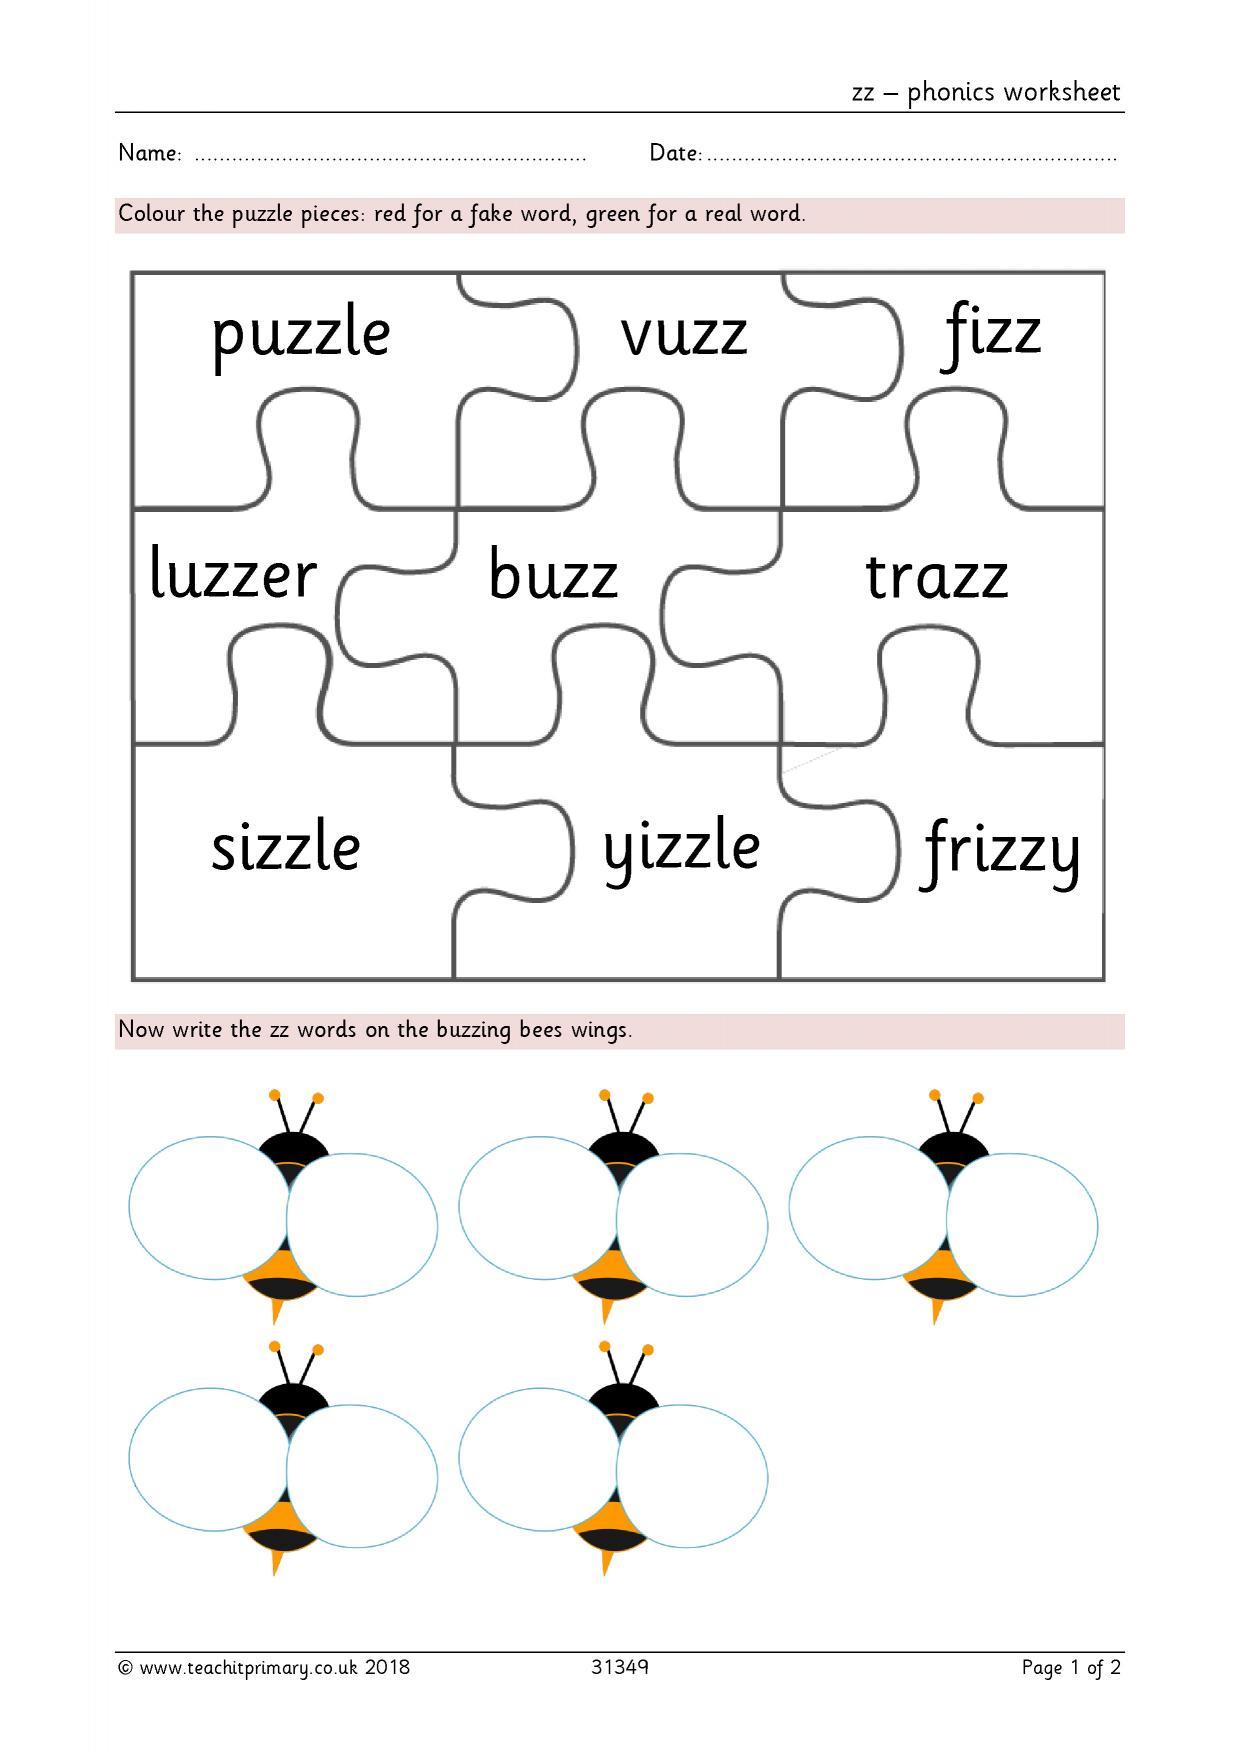 zz - phonics worksheet